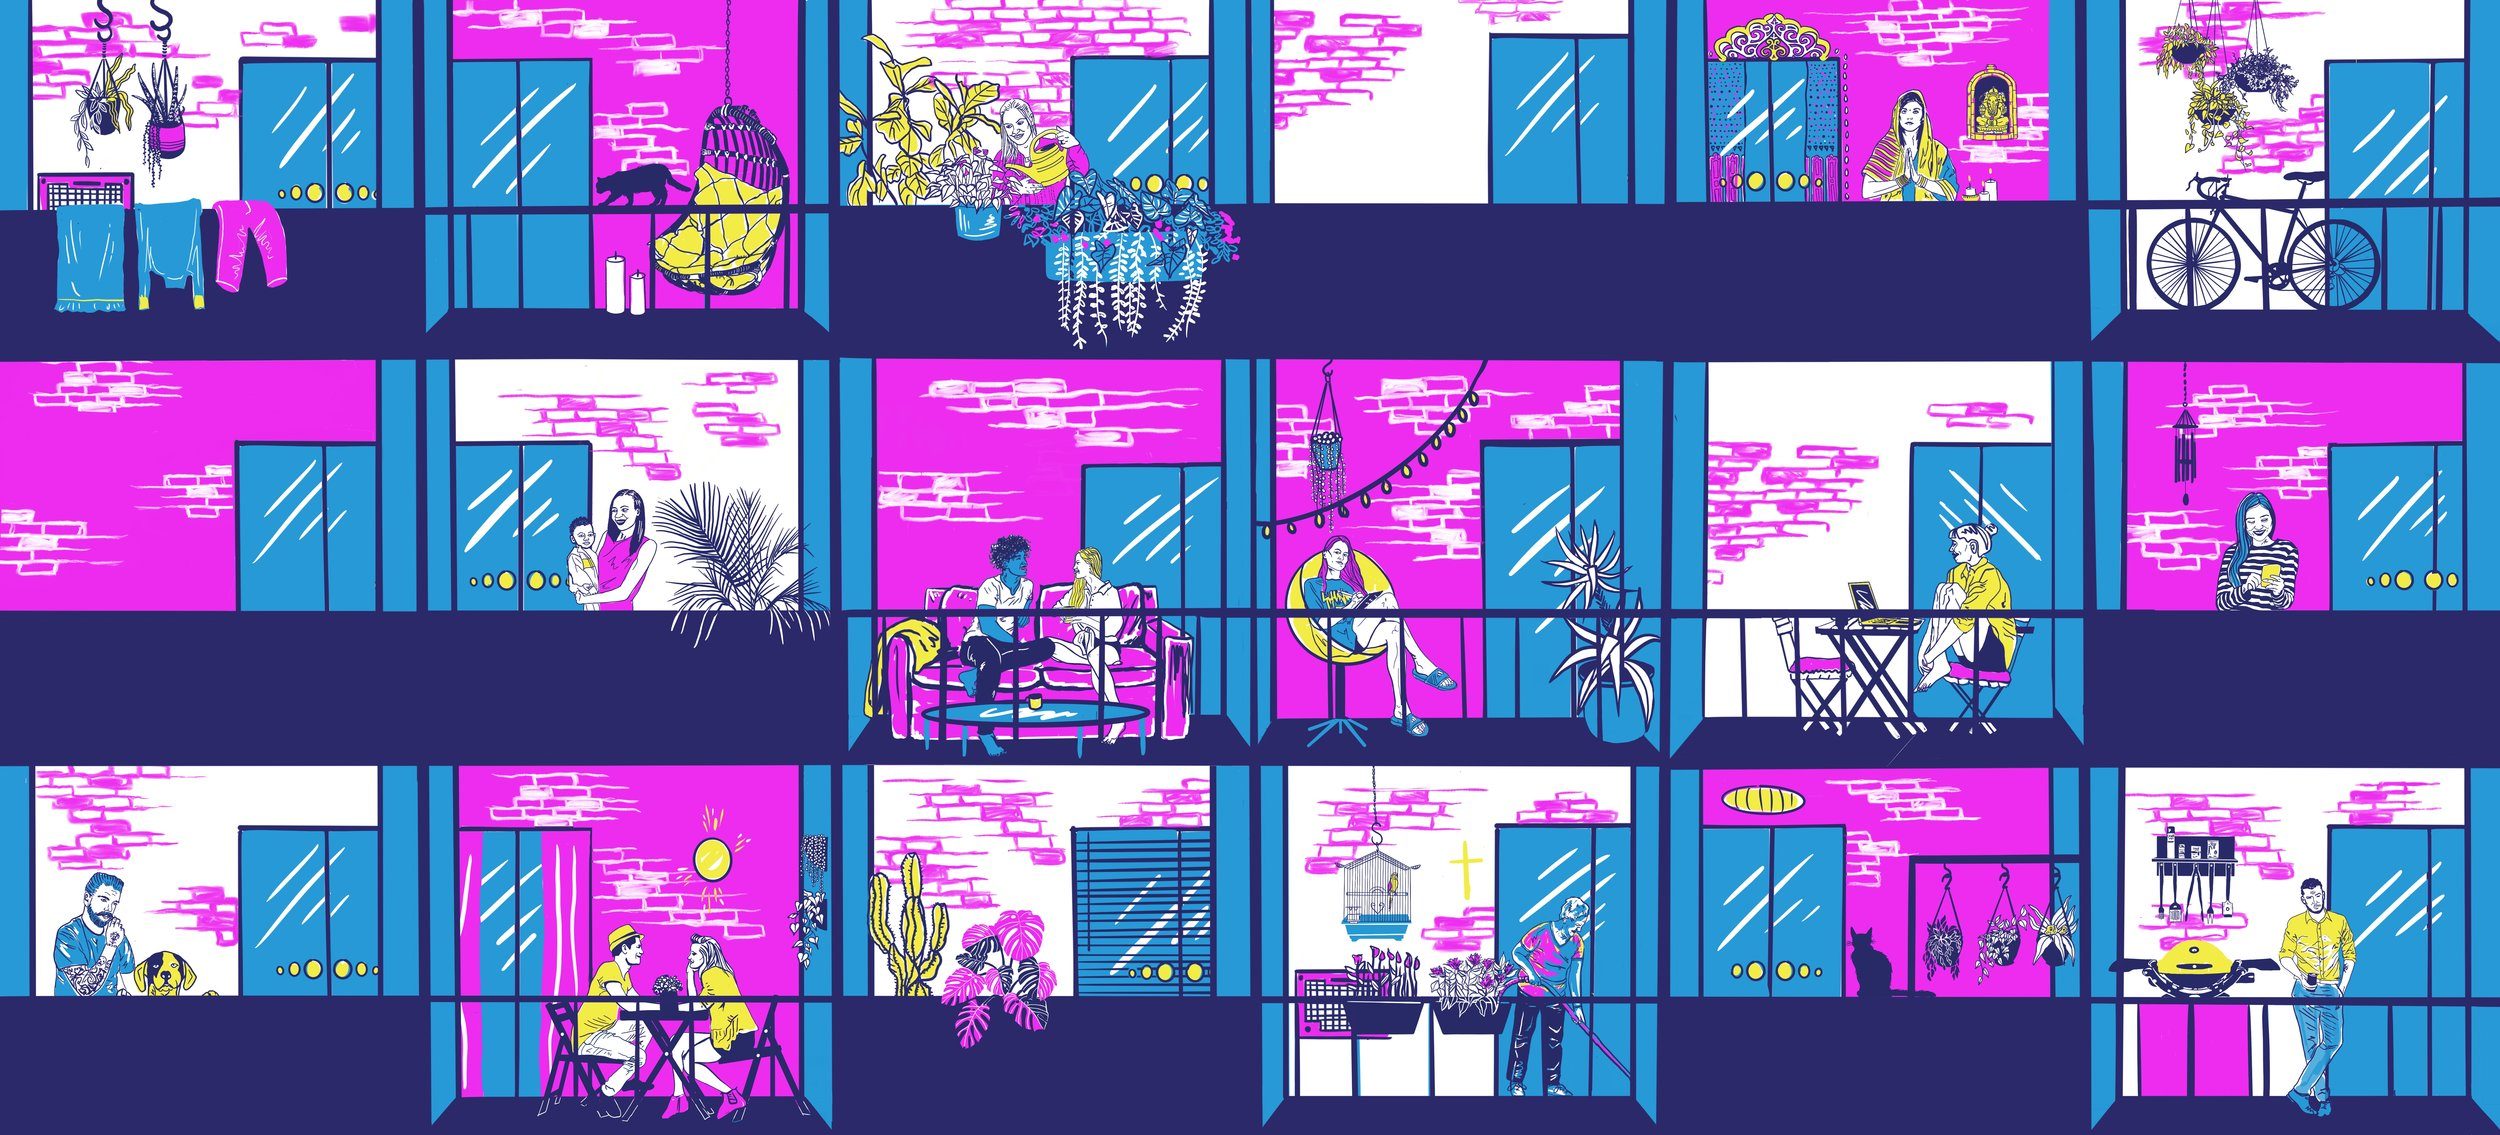 Apartment style artwork for Hepatitis C WA Campaign 2019